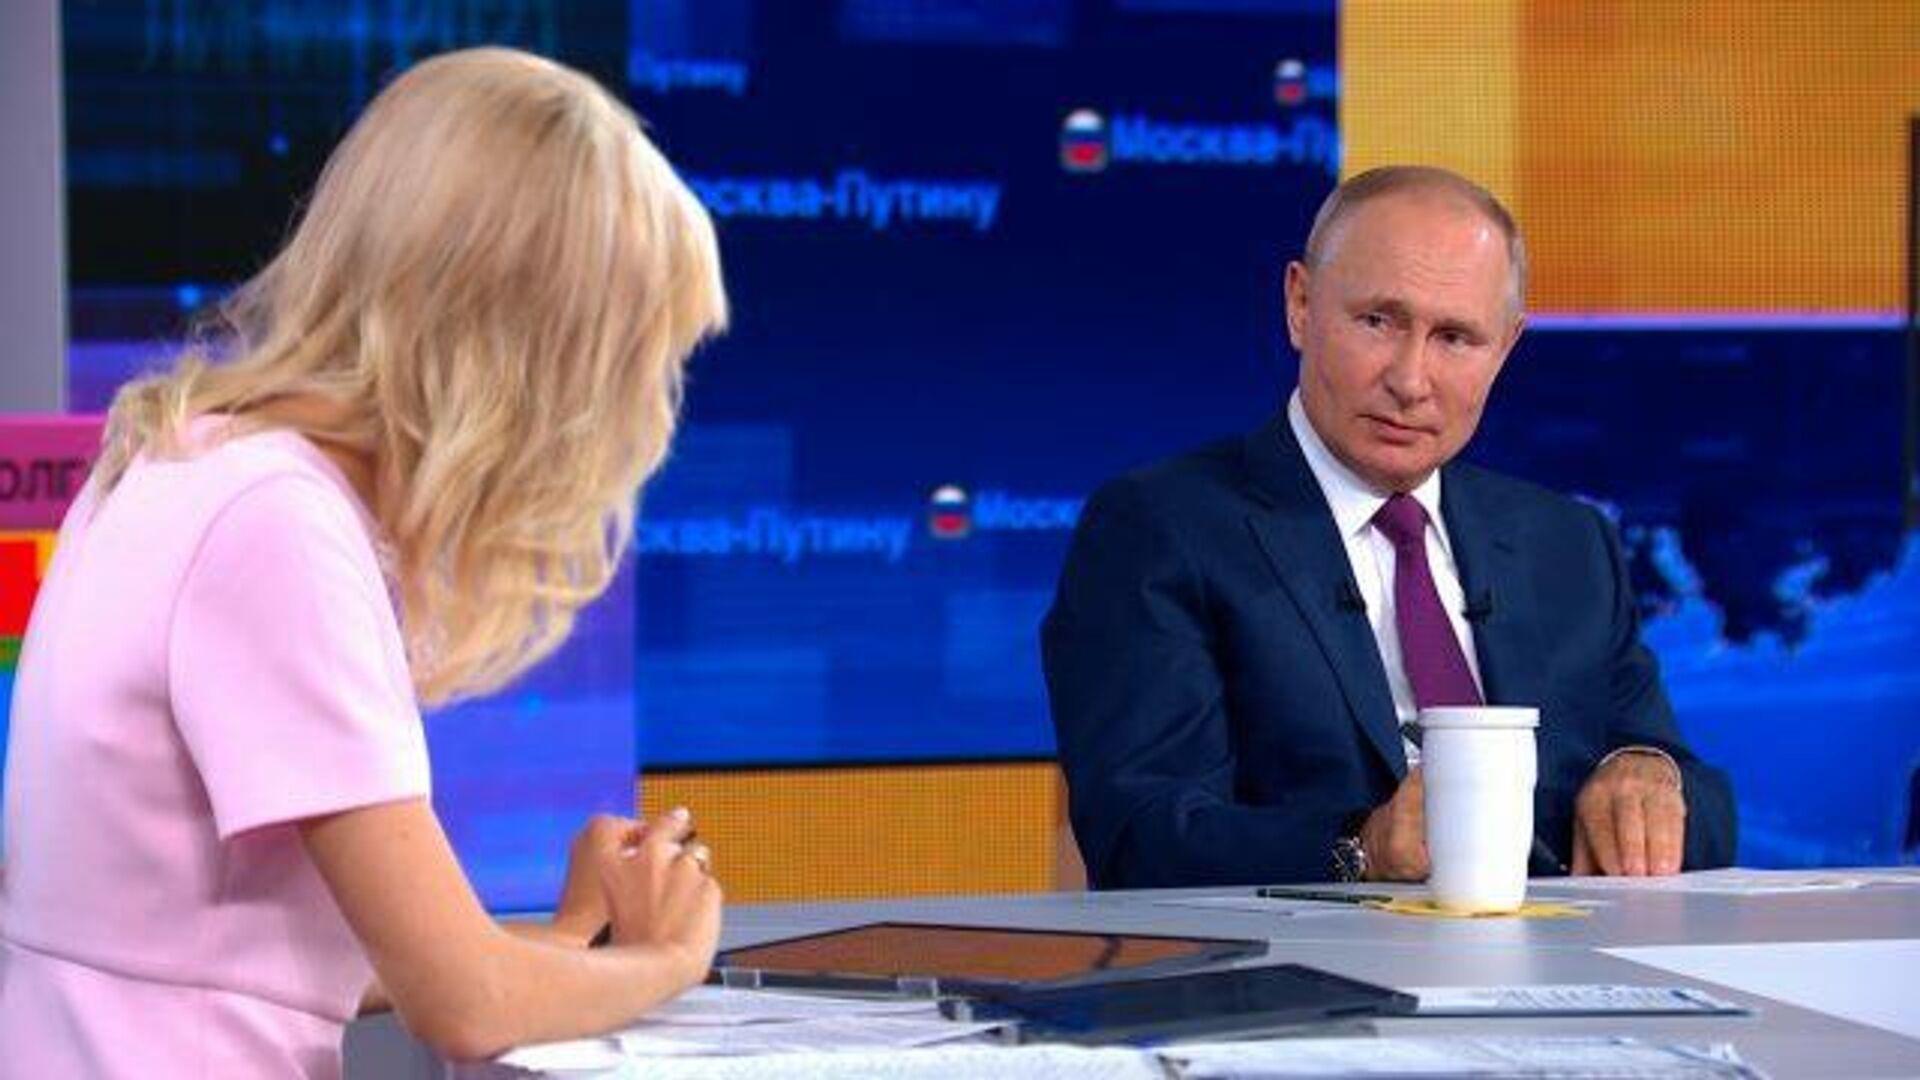 Шутите? Серьезно? – Путину сообщили о хакерских атаках на прямую линию - РИА Новости, 1920, 30.06.2021